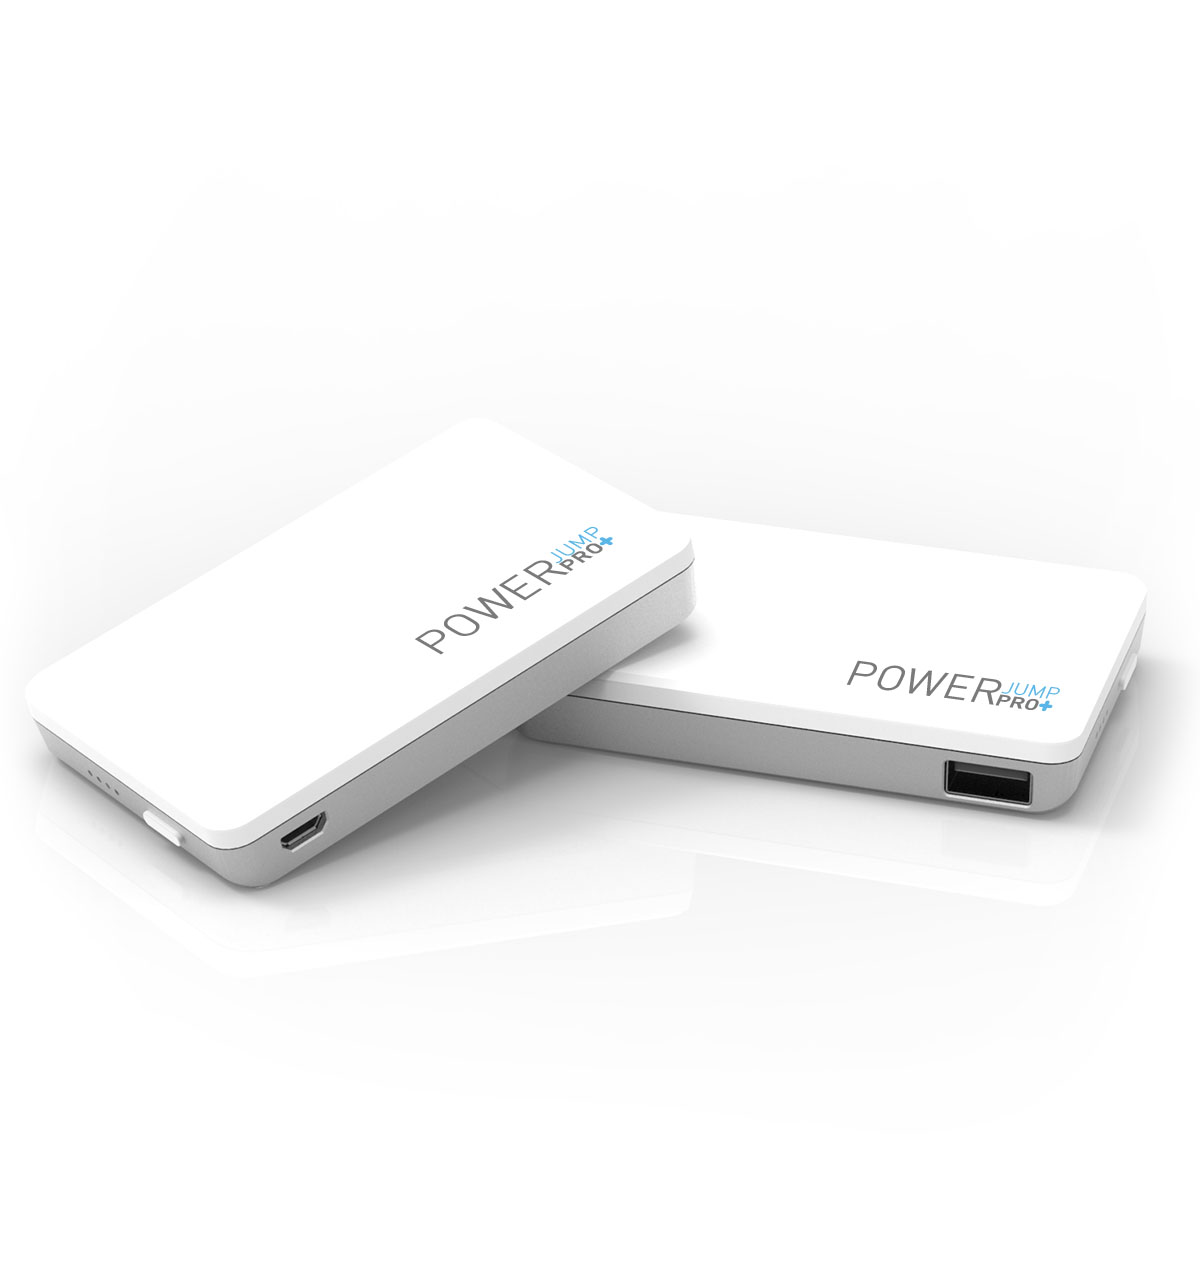 PowerStick PowerJump Pro+